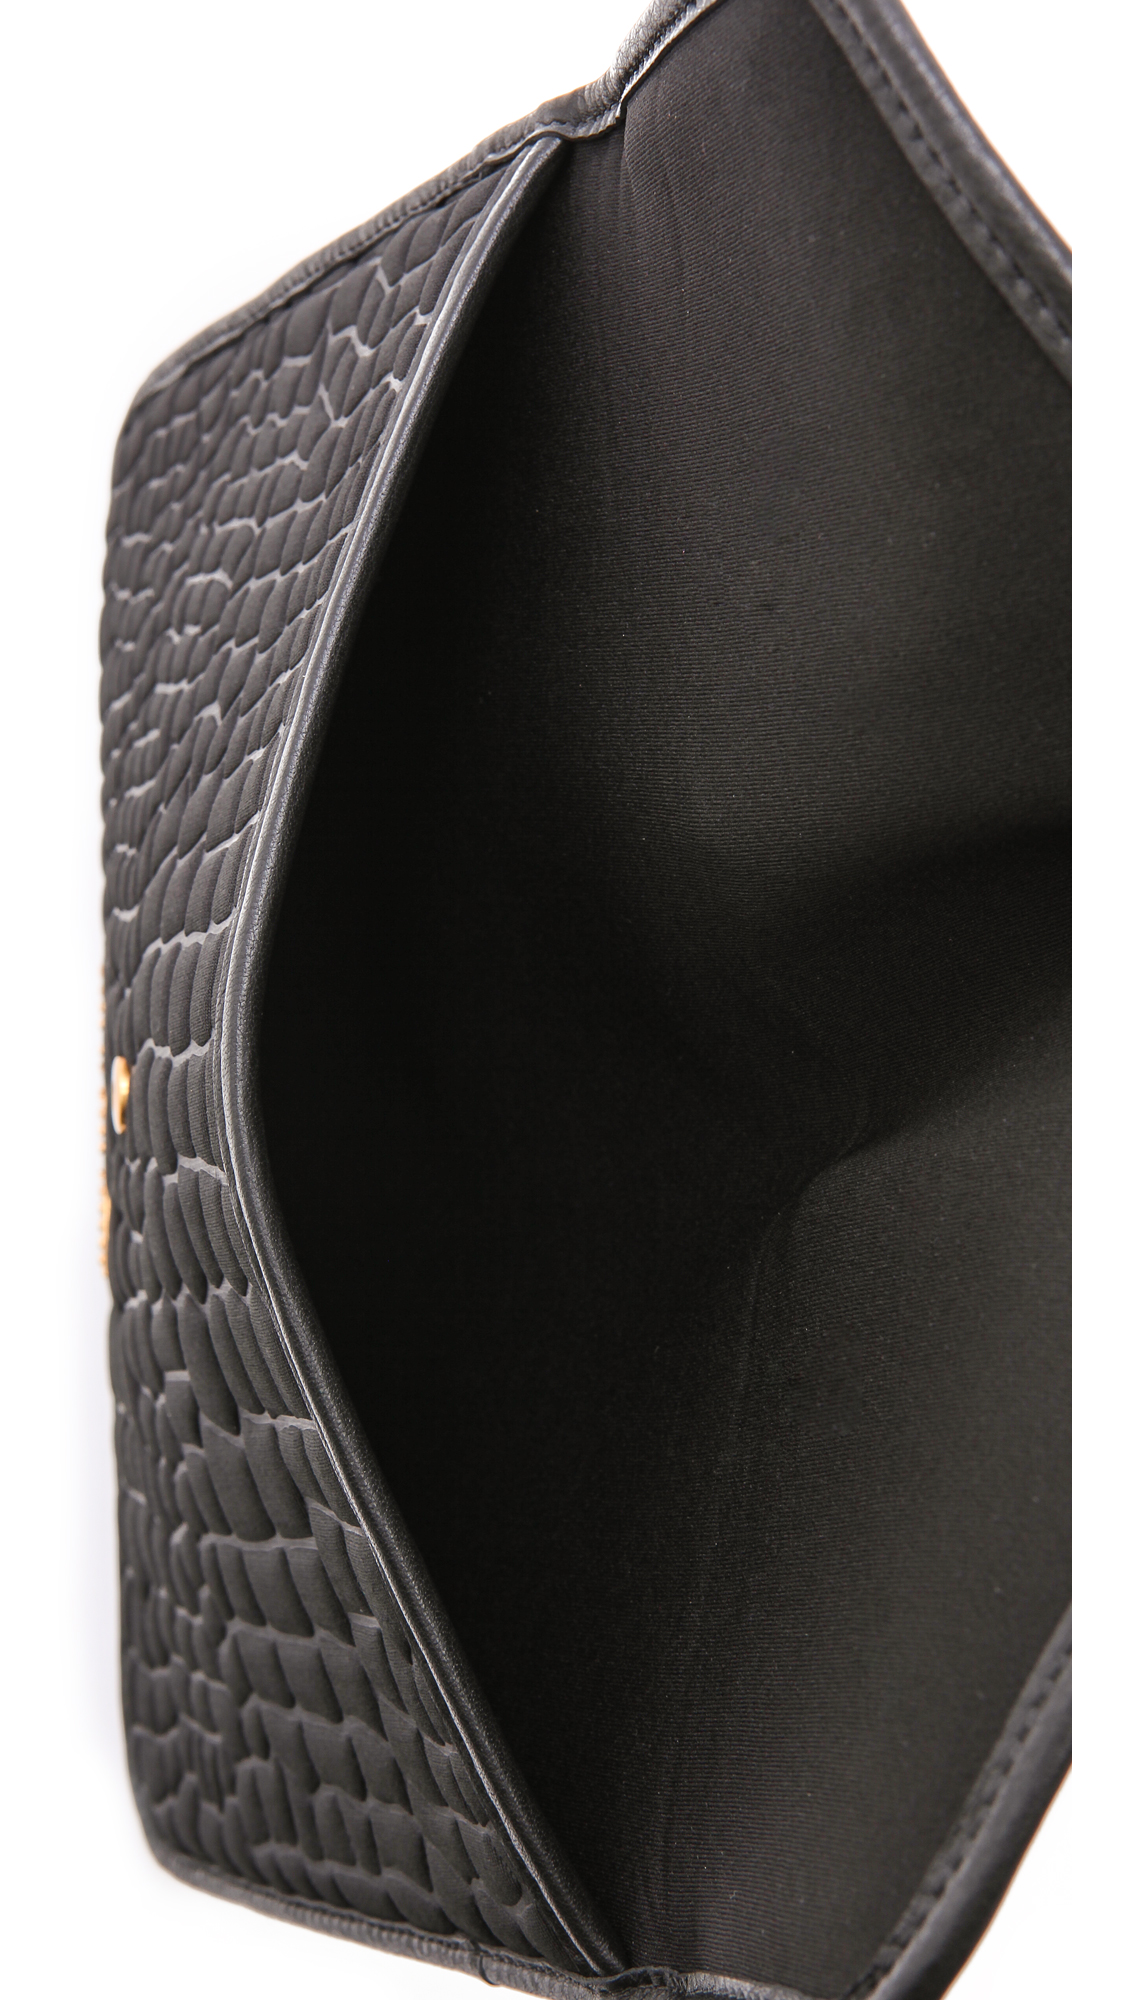 80febc5fd5af Marc by Marc Jacobs Neoprene Croc Embossed Tablet Envelope Clutch ...